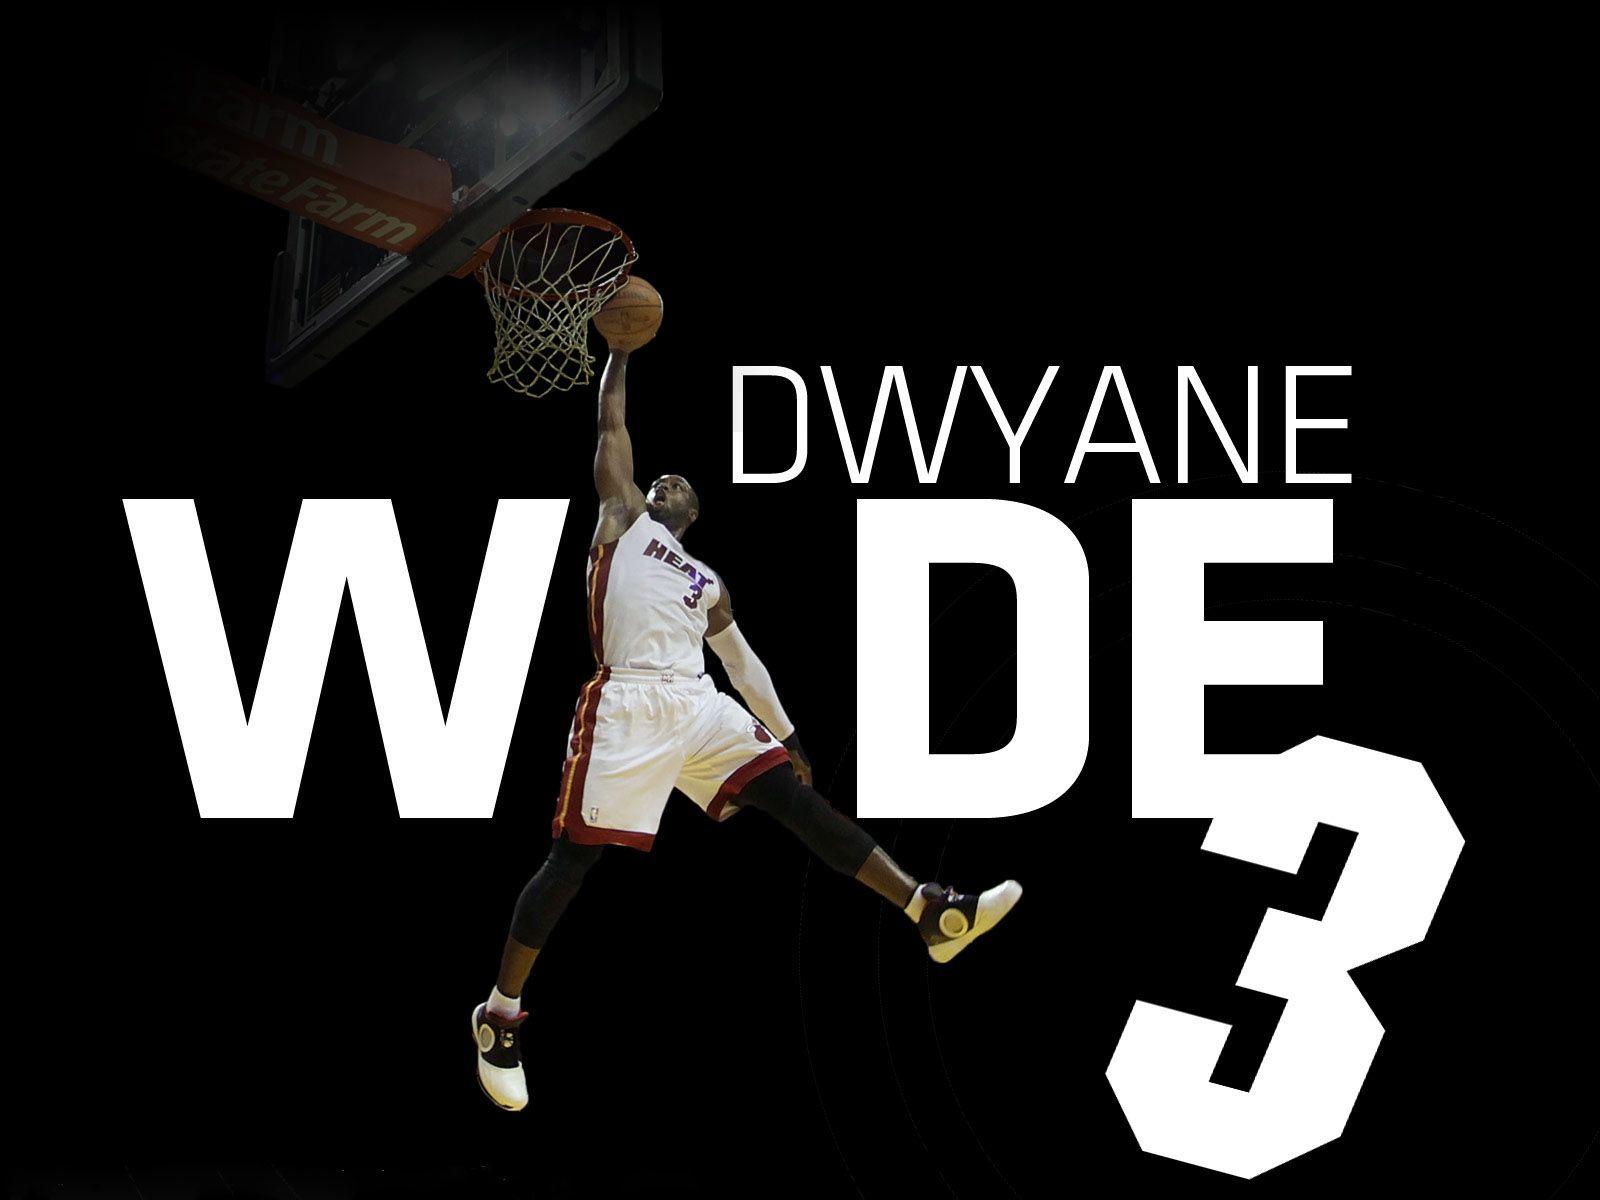 Miami Heat Wallpapers Hd Widescreen1 Dwyane Wade Wallpaper Dwyane Wade Basketball Tattoos